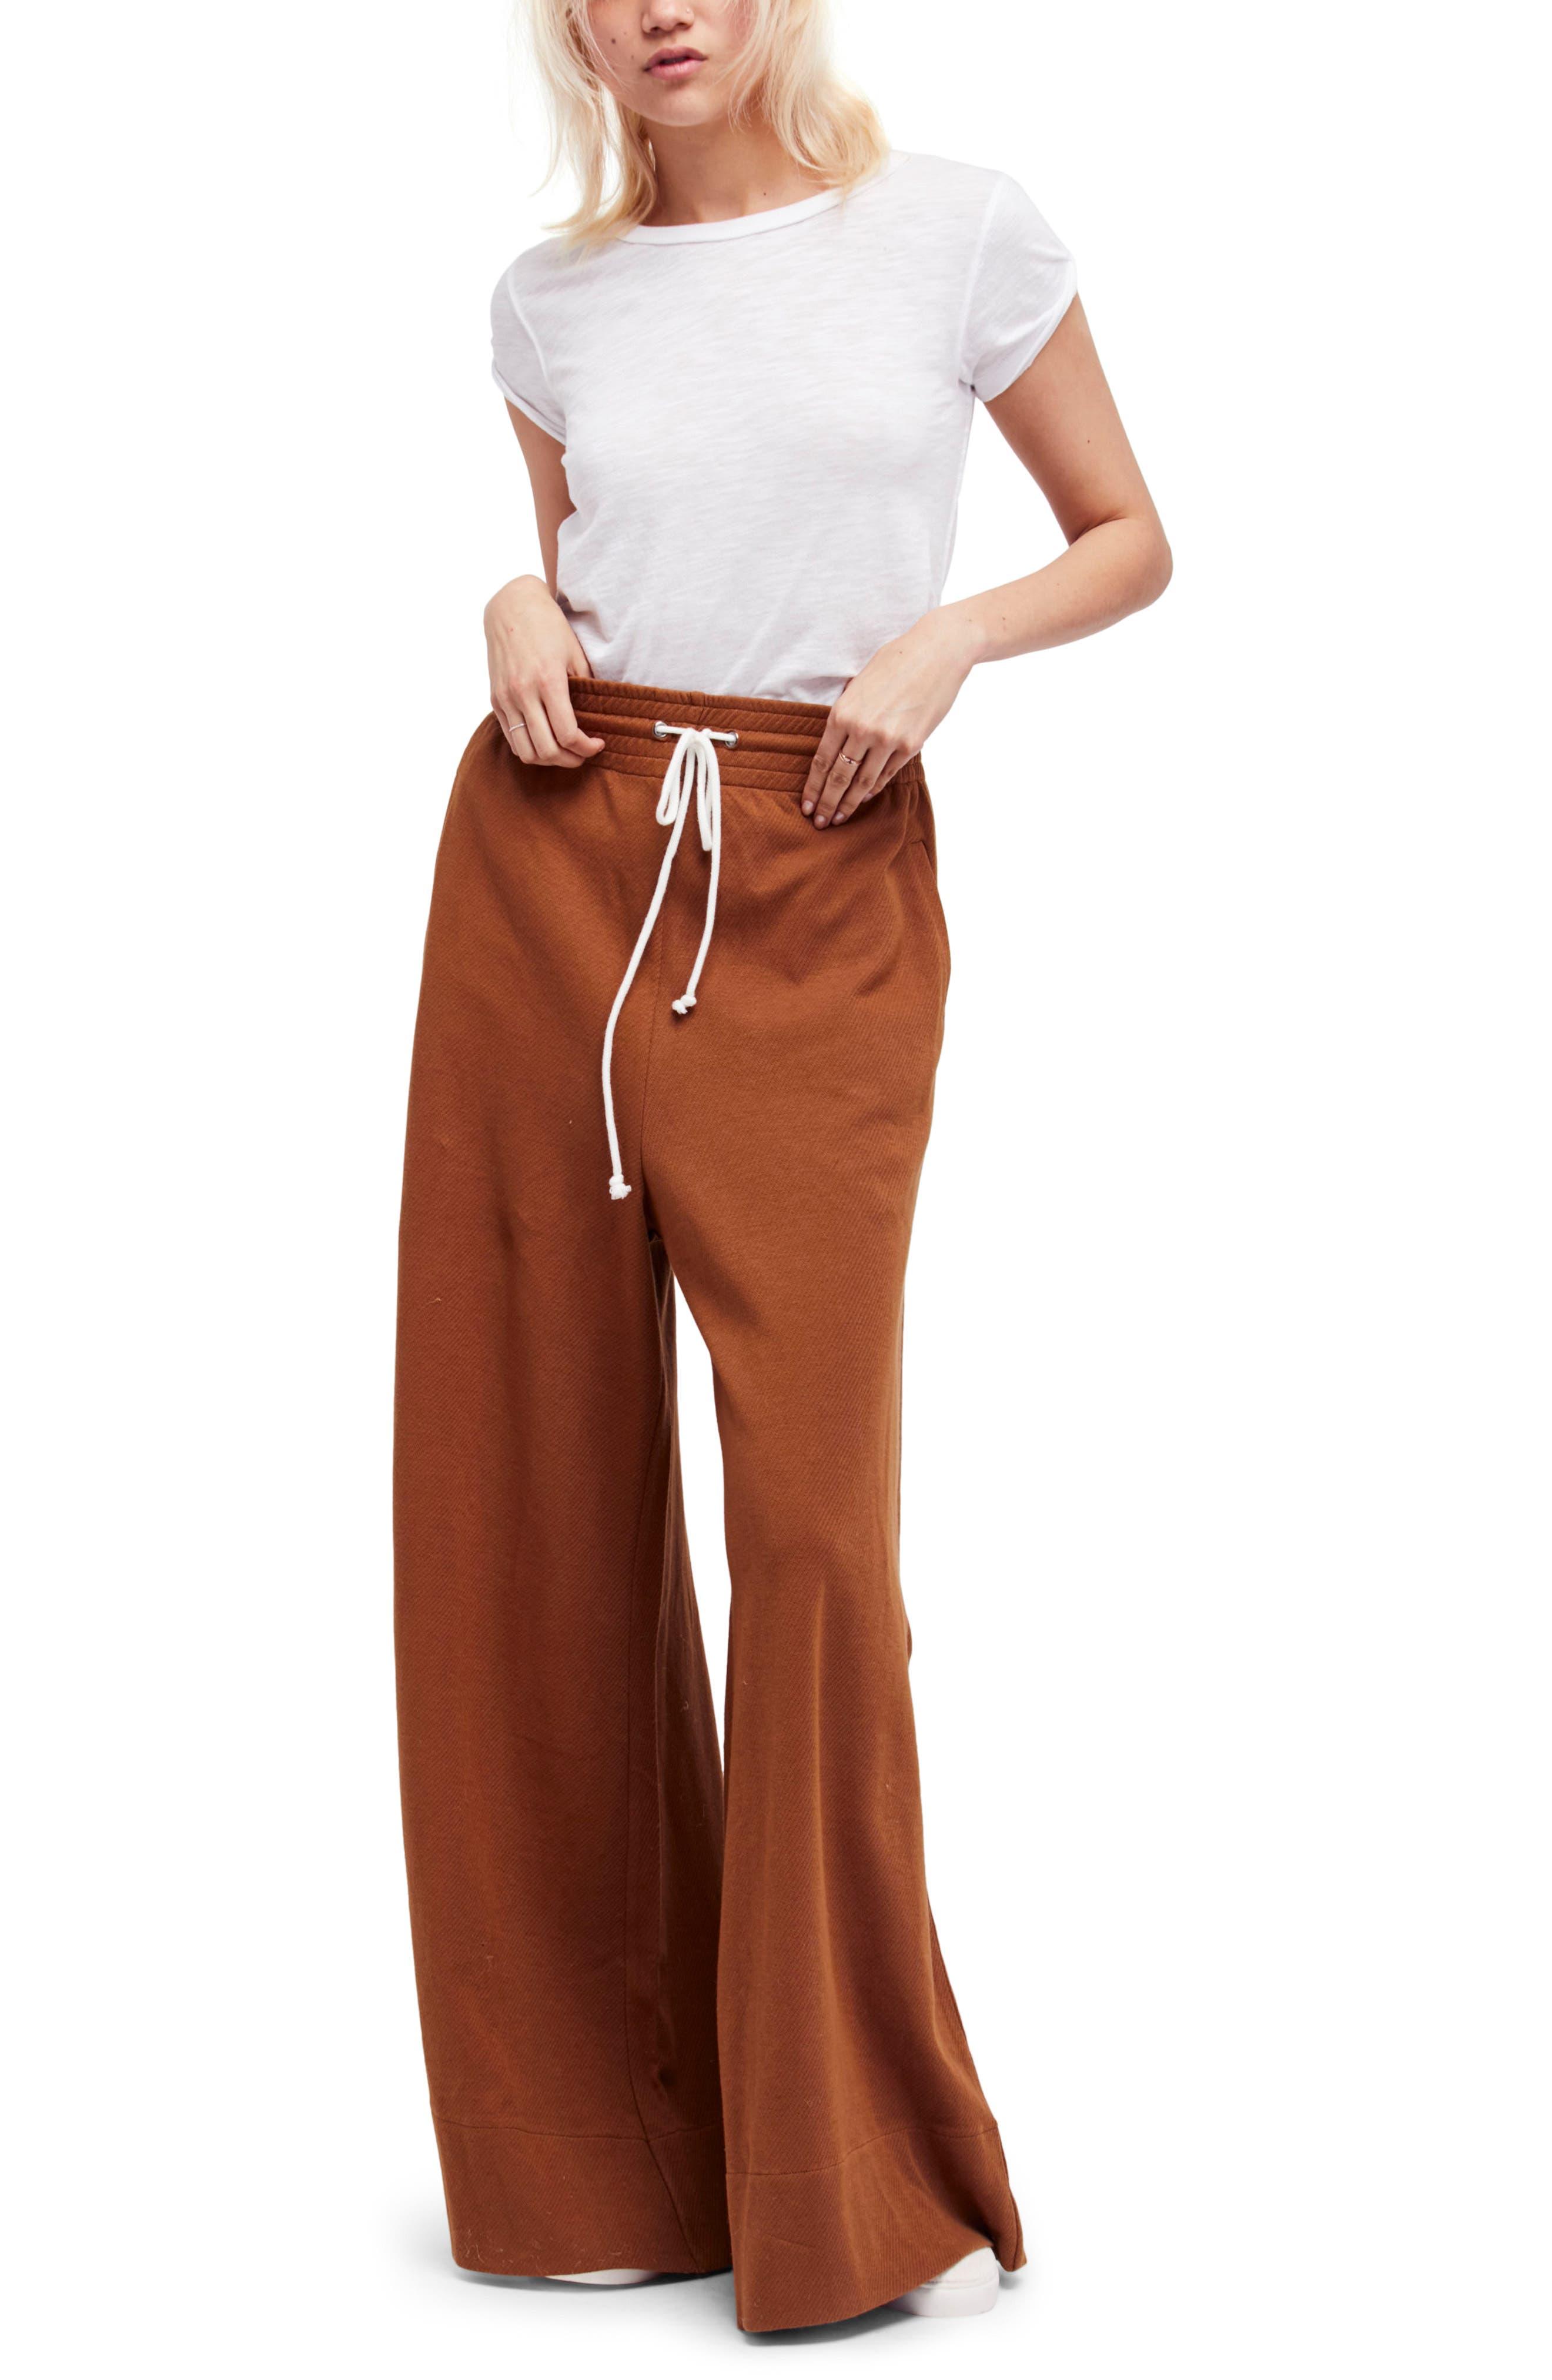 Strangelove Flare Sweatpants,                         Main,                         color, Brown